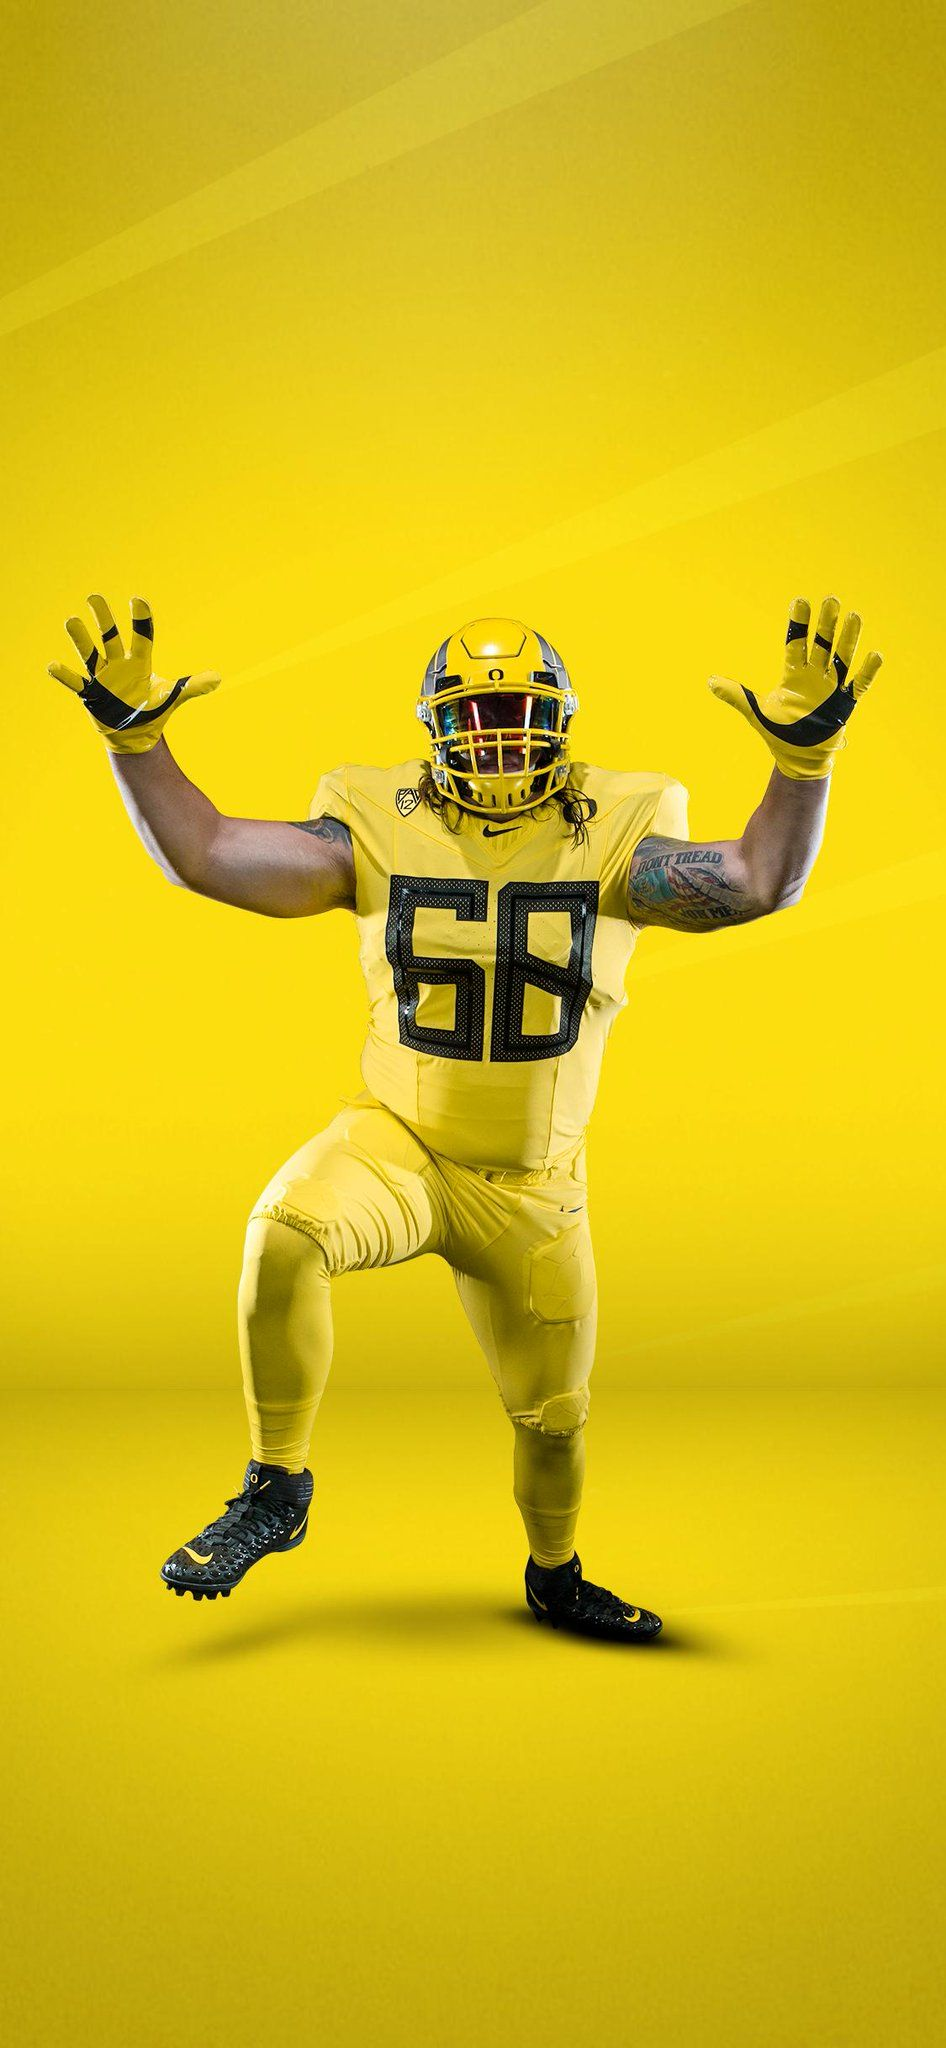 2019 University Of Oregon Ducks Football Uniforms All Yellow Oregon Ducks Football Ducks Football Football Helmets